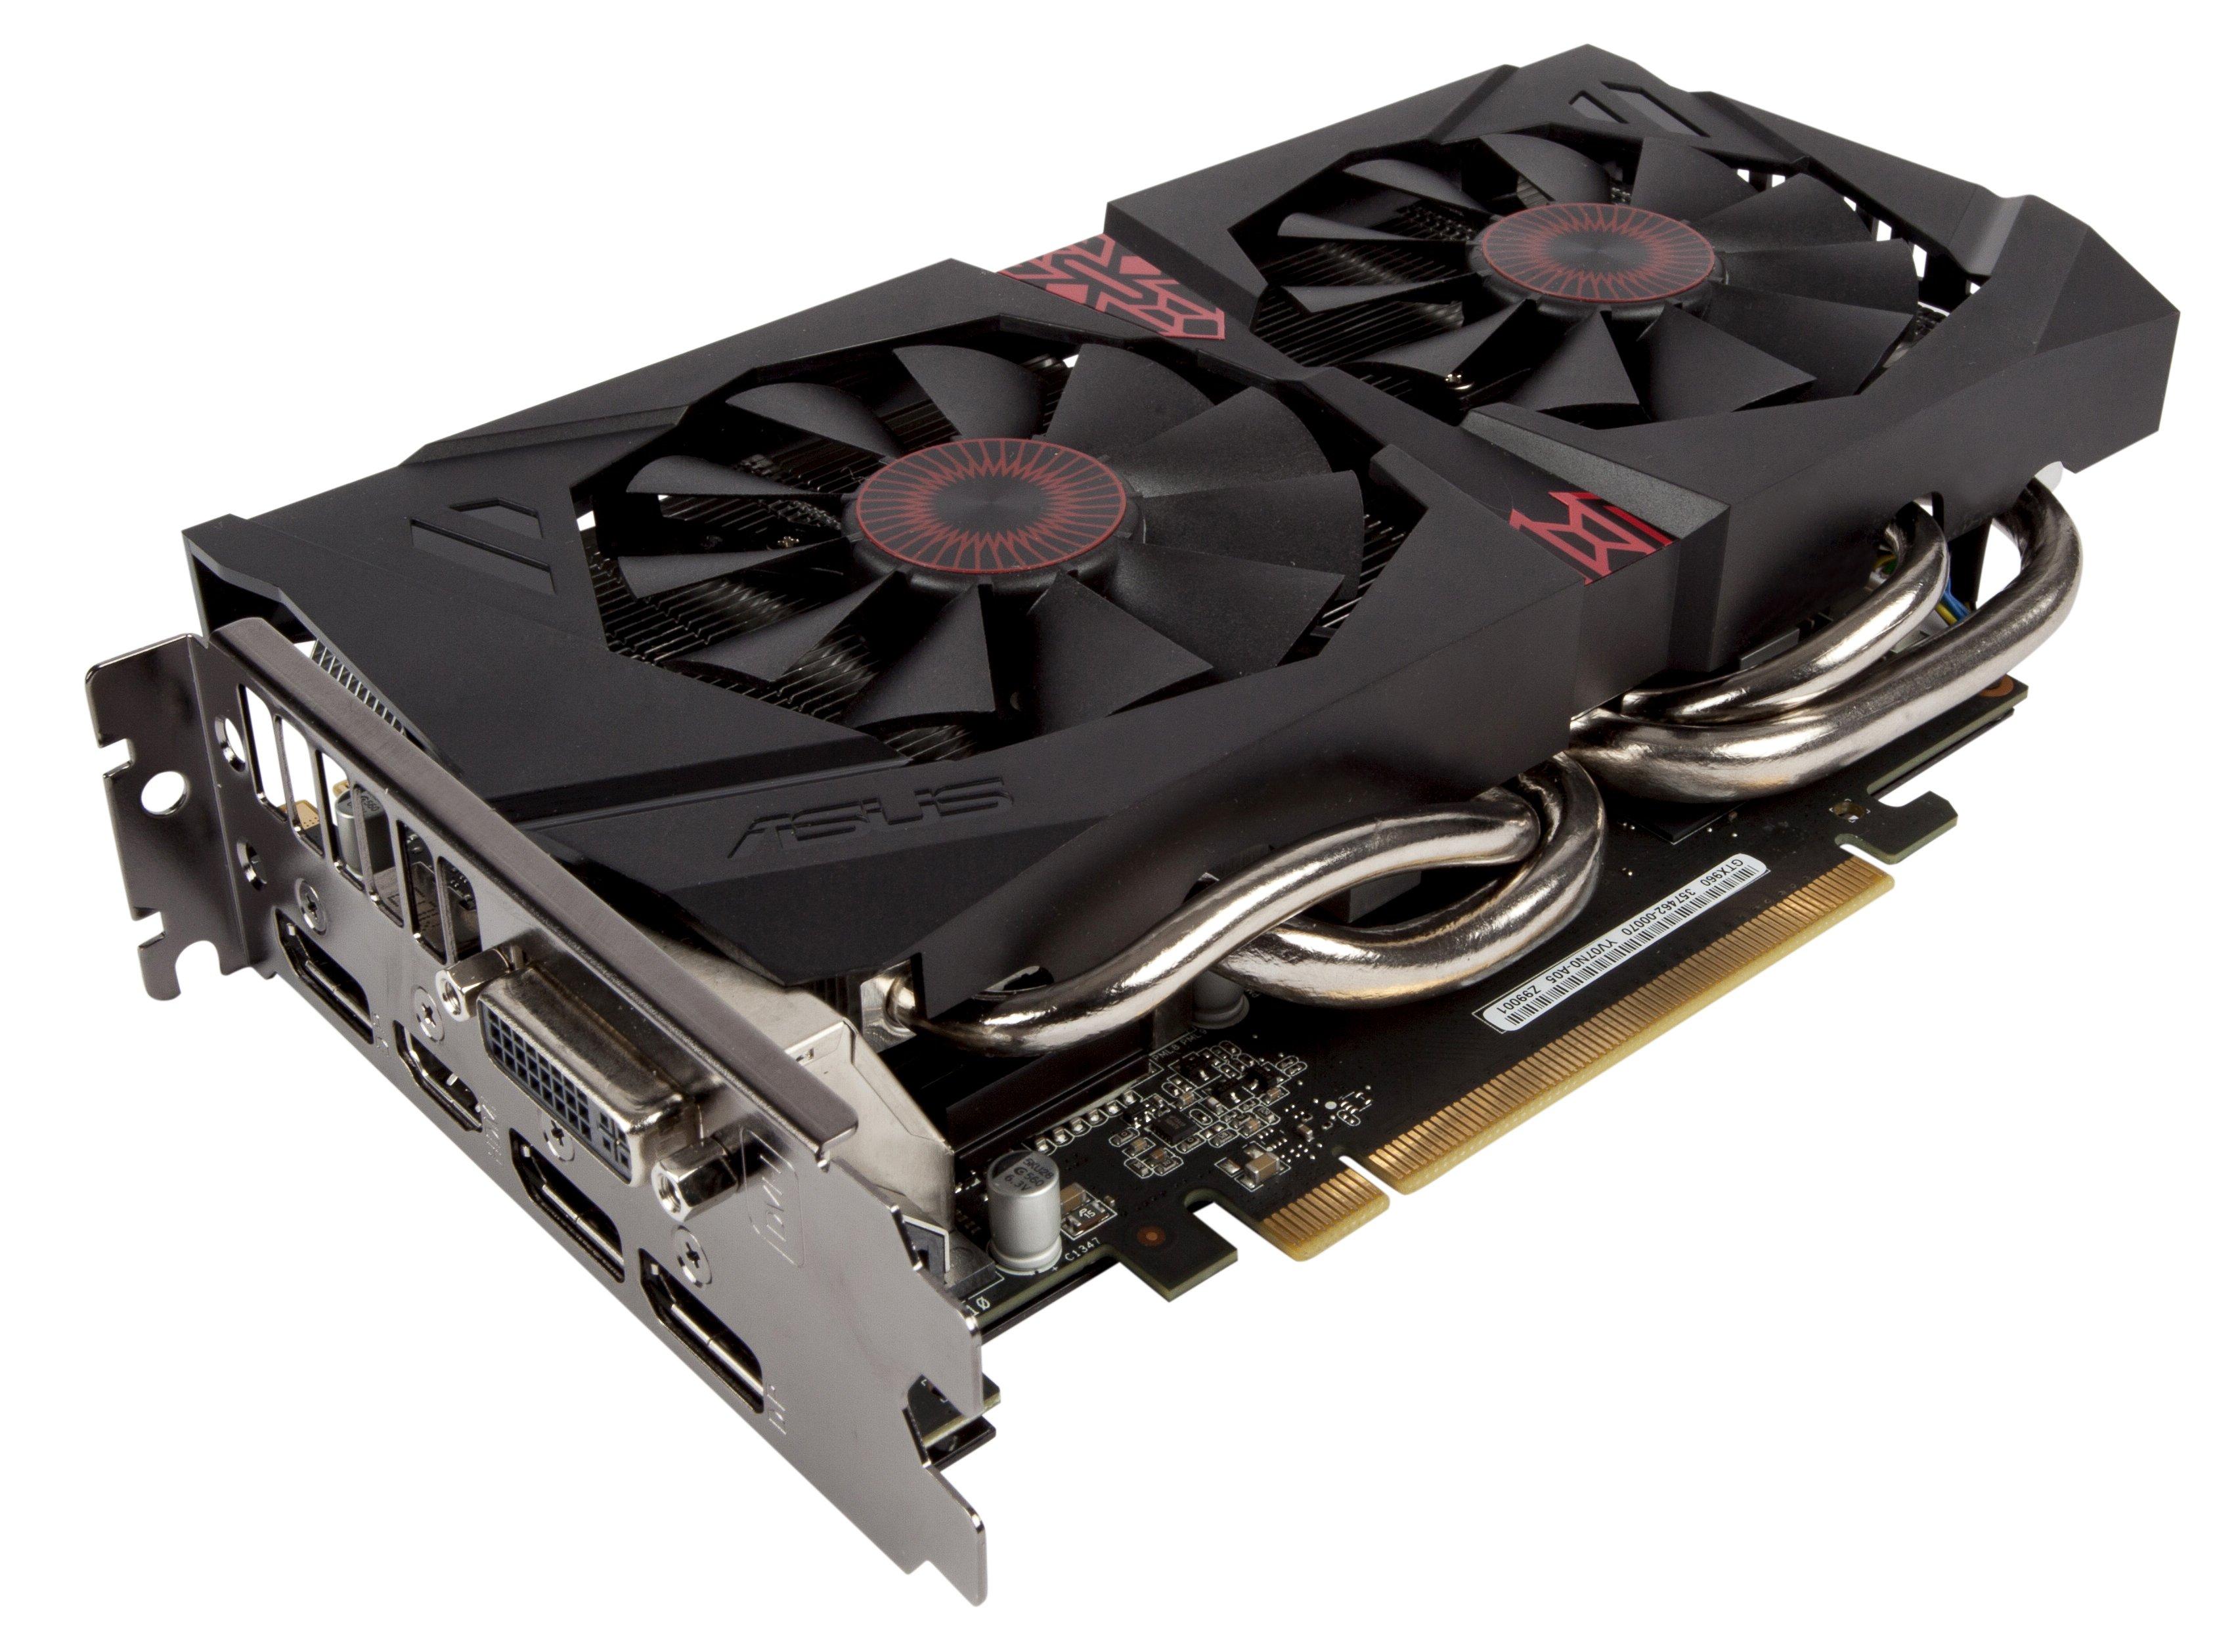 Nvidia Geforce Gtx 960 Review Expert Reviews Msi 750 Ti 2gb Twin Frozr Gaming Asus Strix